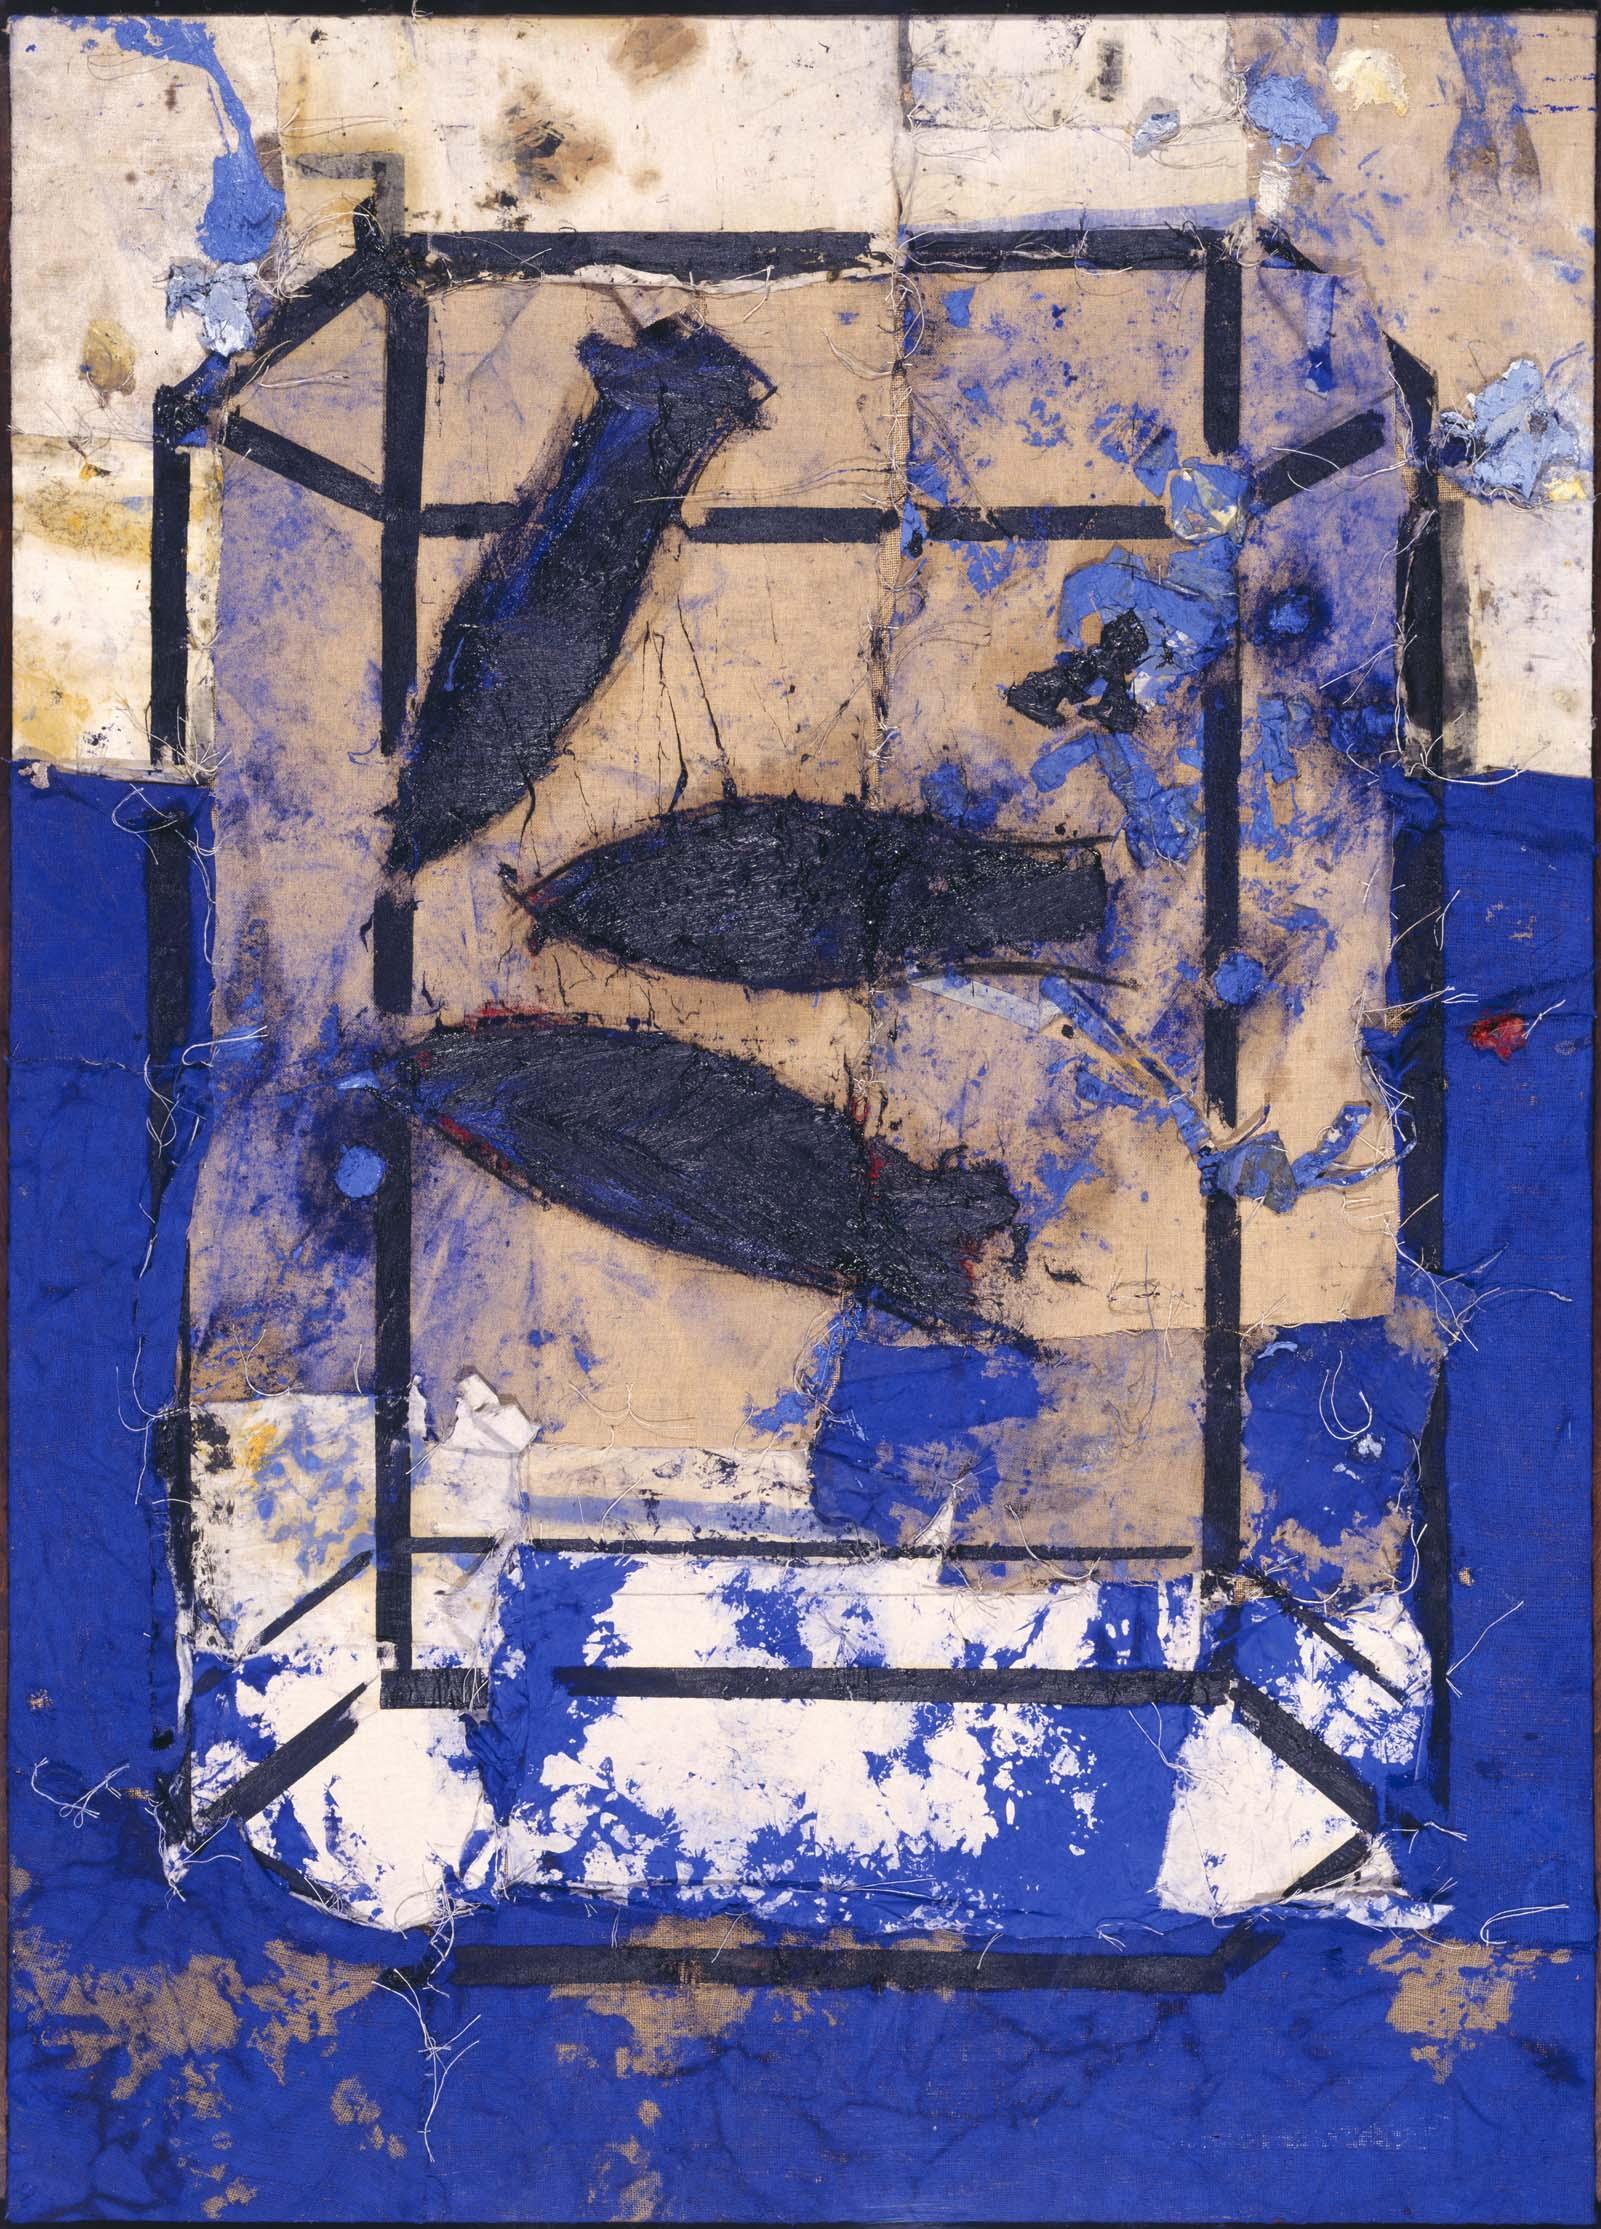 Pintura: Manolo Valdes